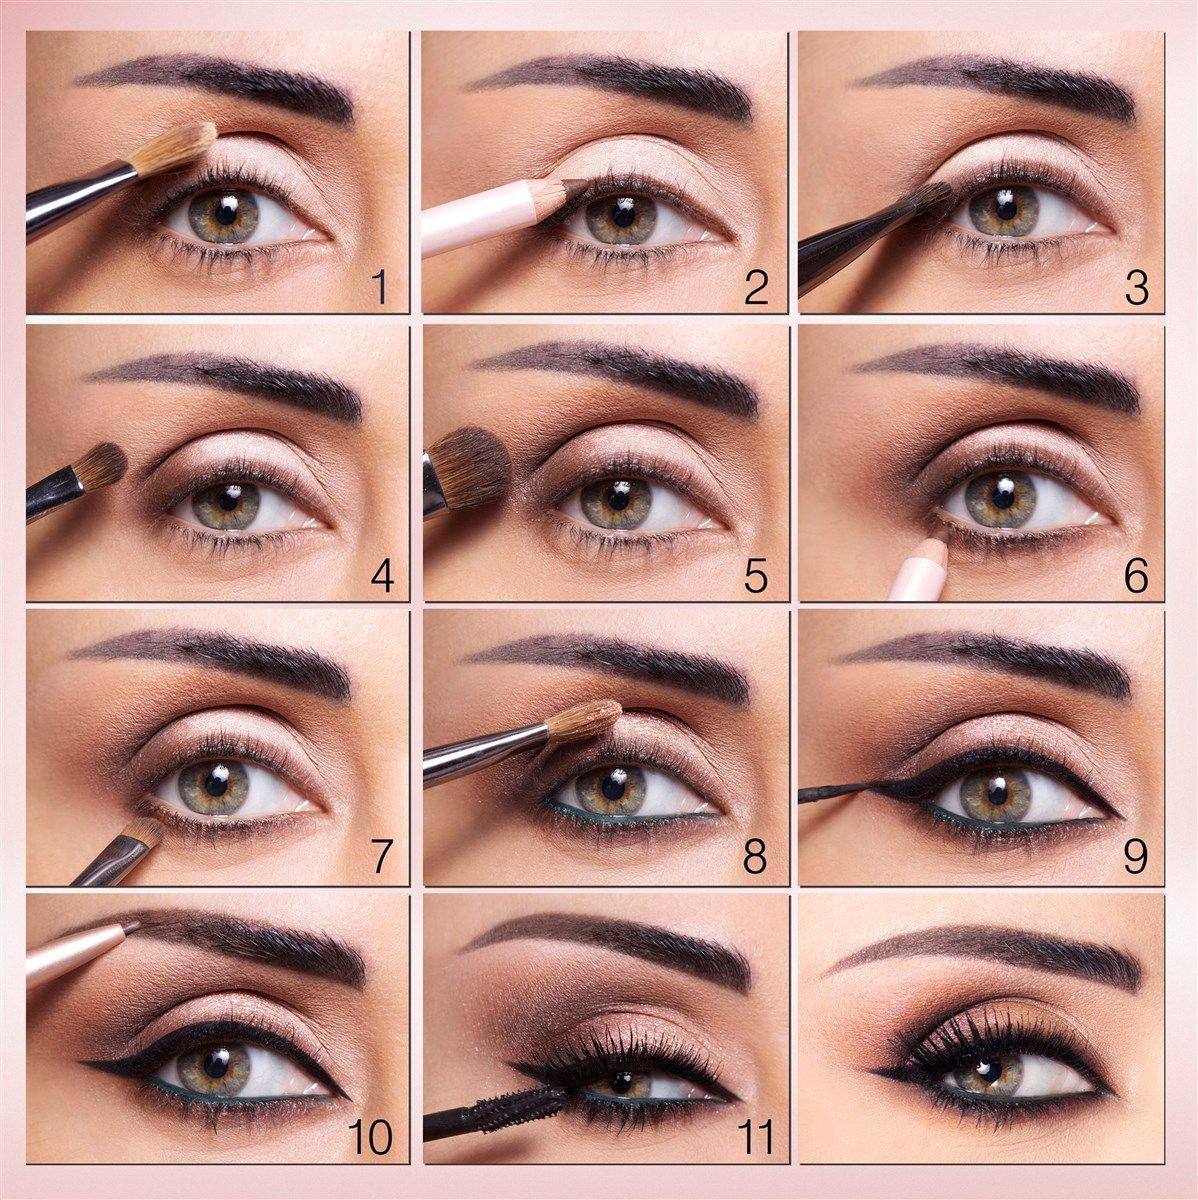 how to apply eye makeup properly - mugeek vidalondon